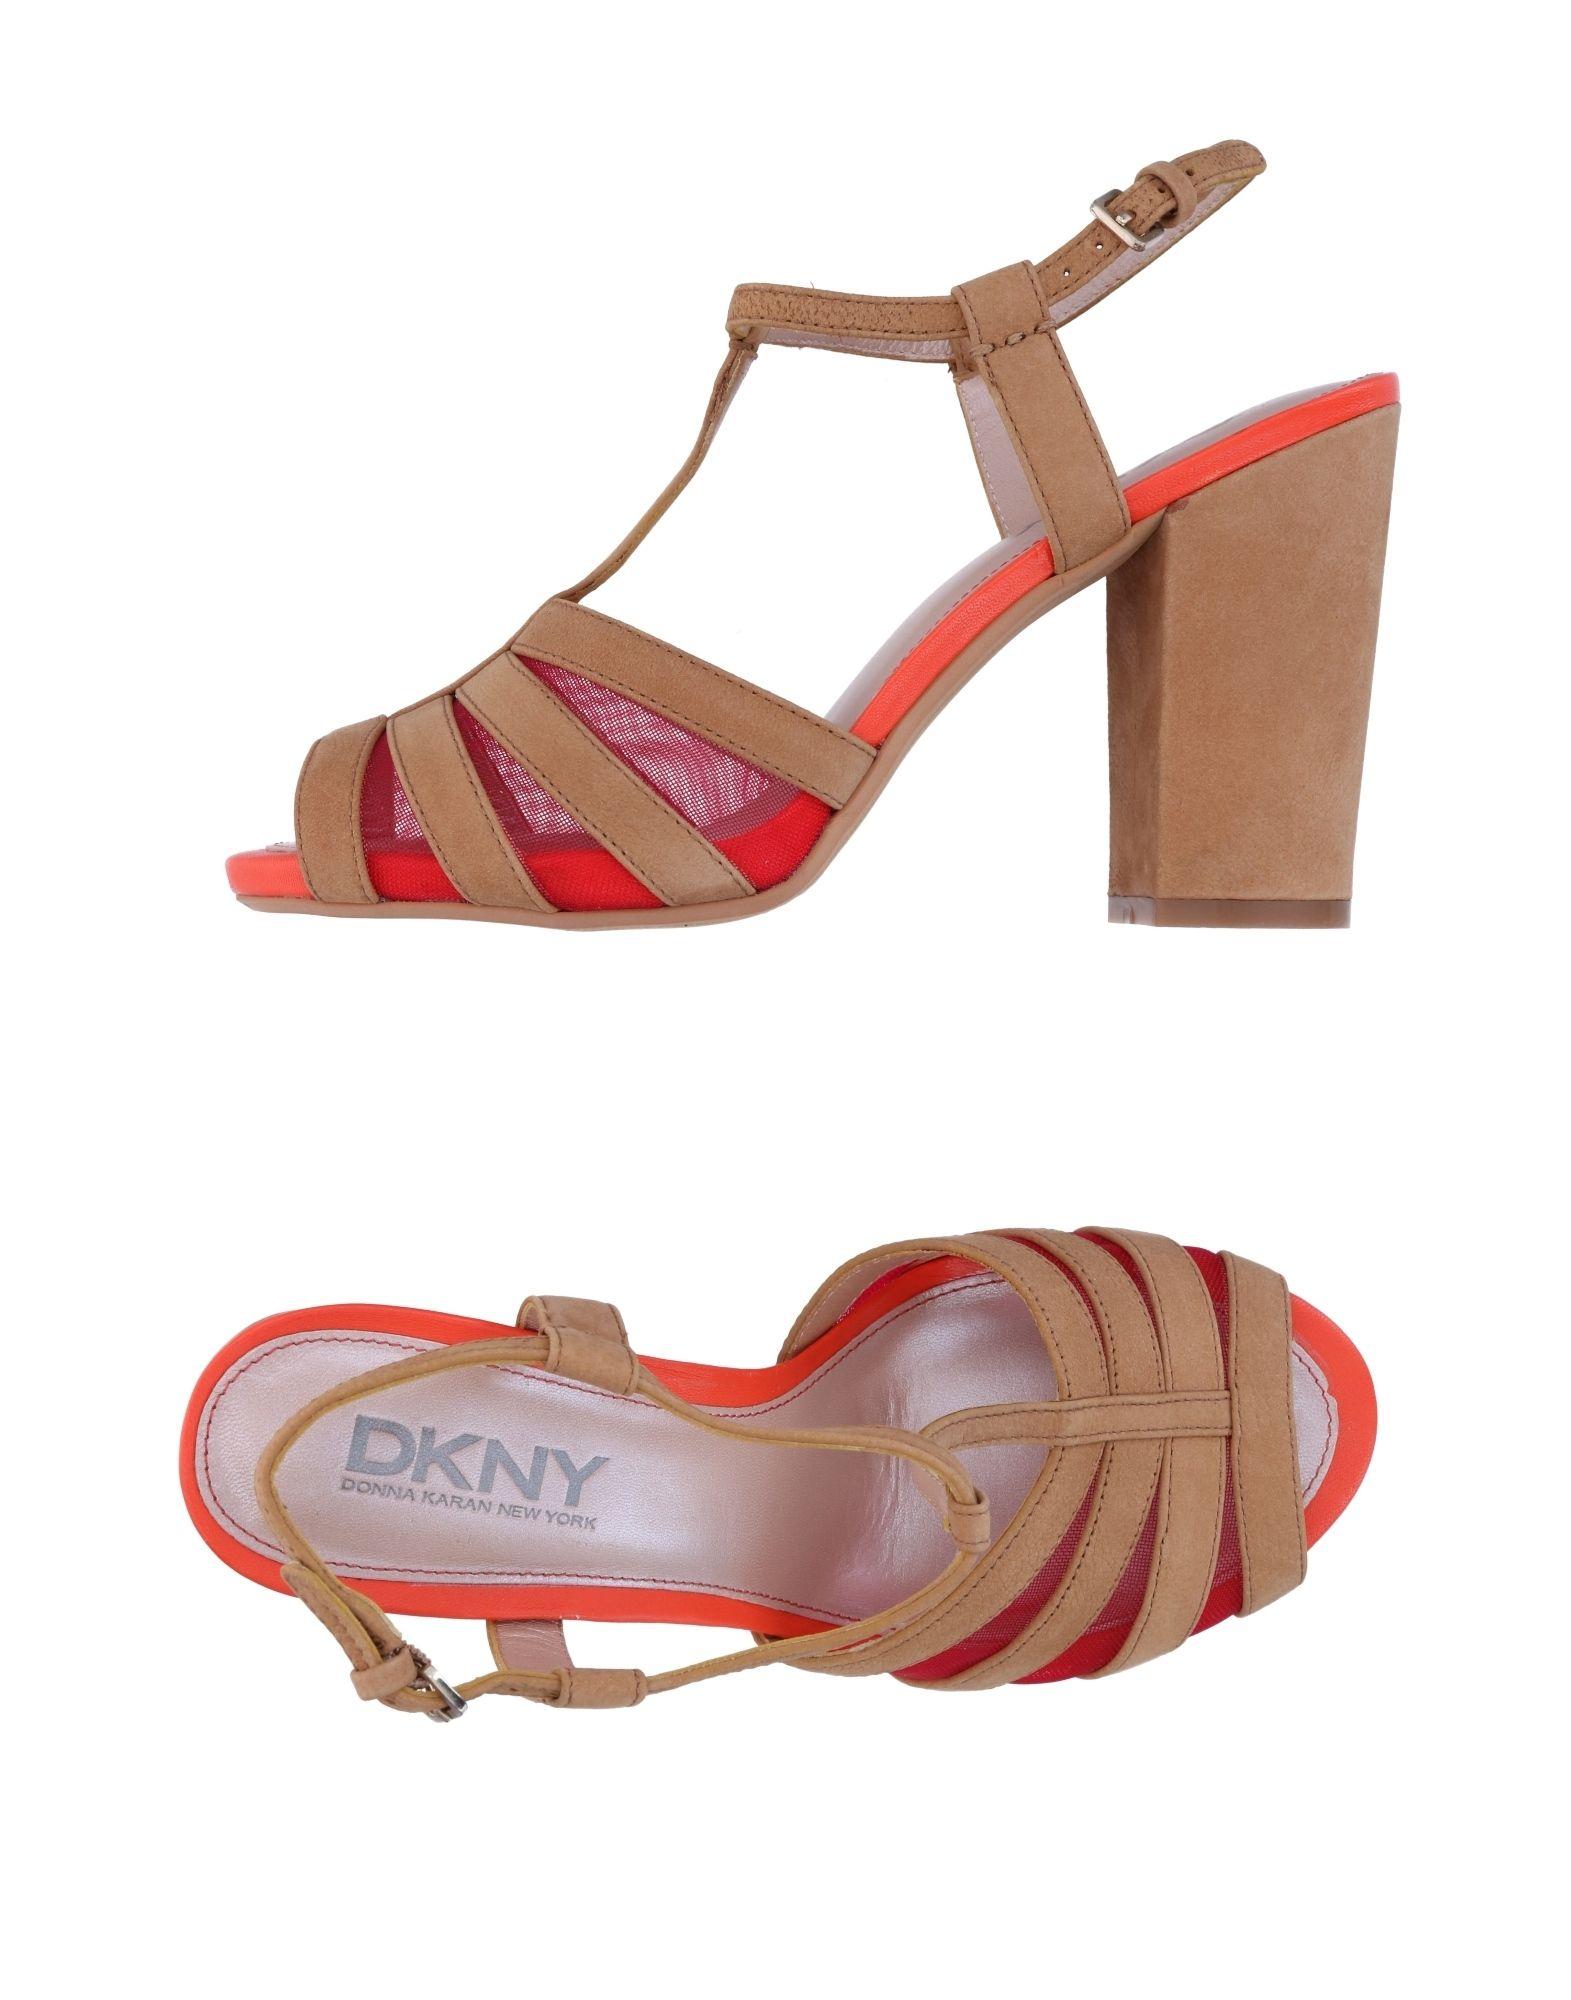 03f7b75573805c Dkny Sandals - Women Dkny Sandals online on YOOX United States - 11294152QO